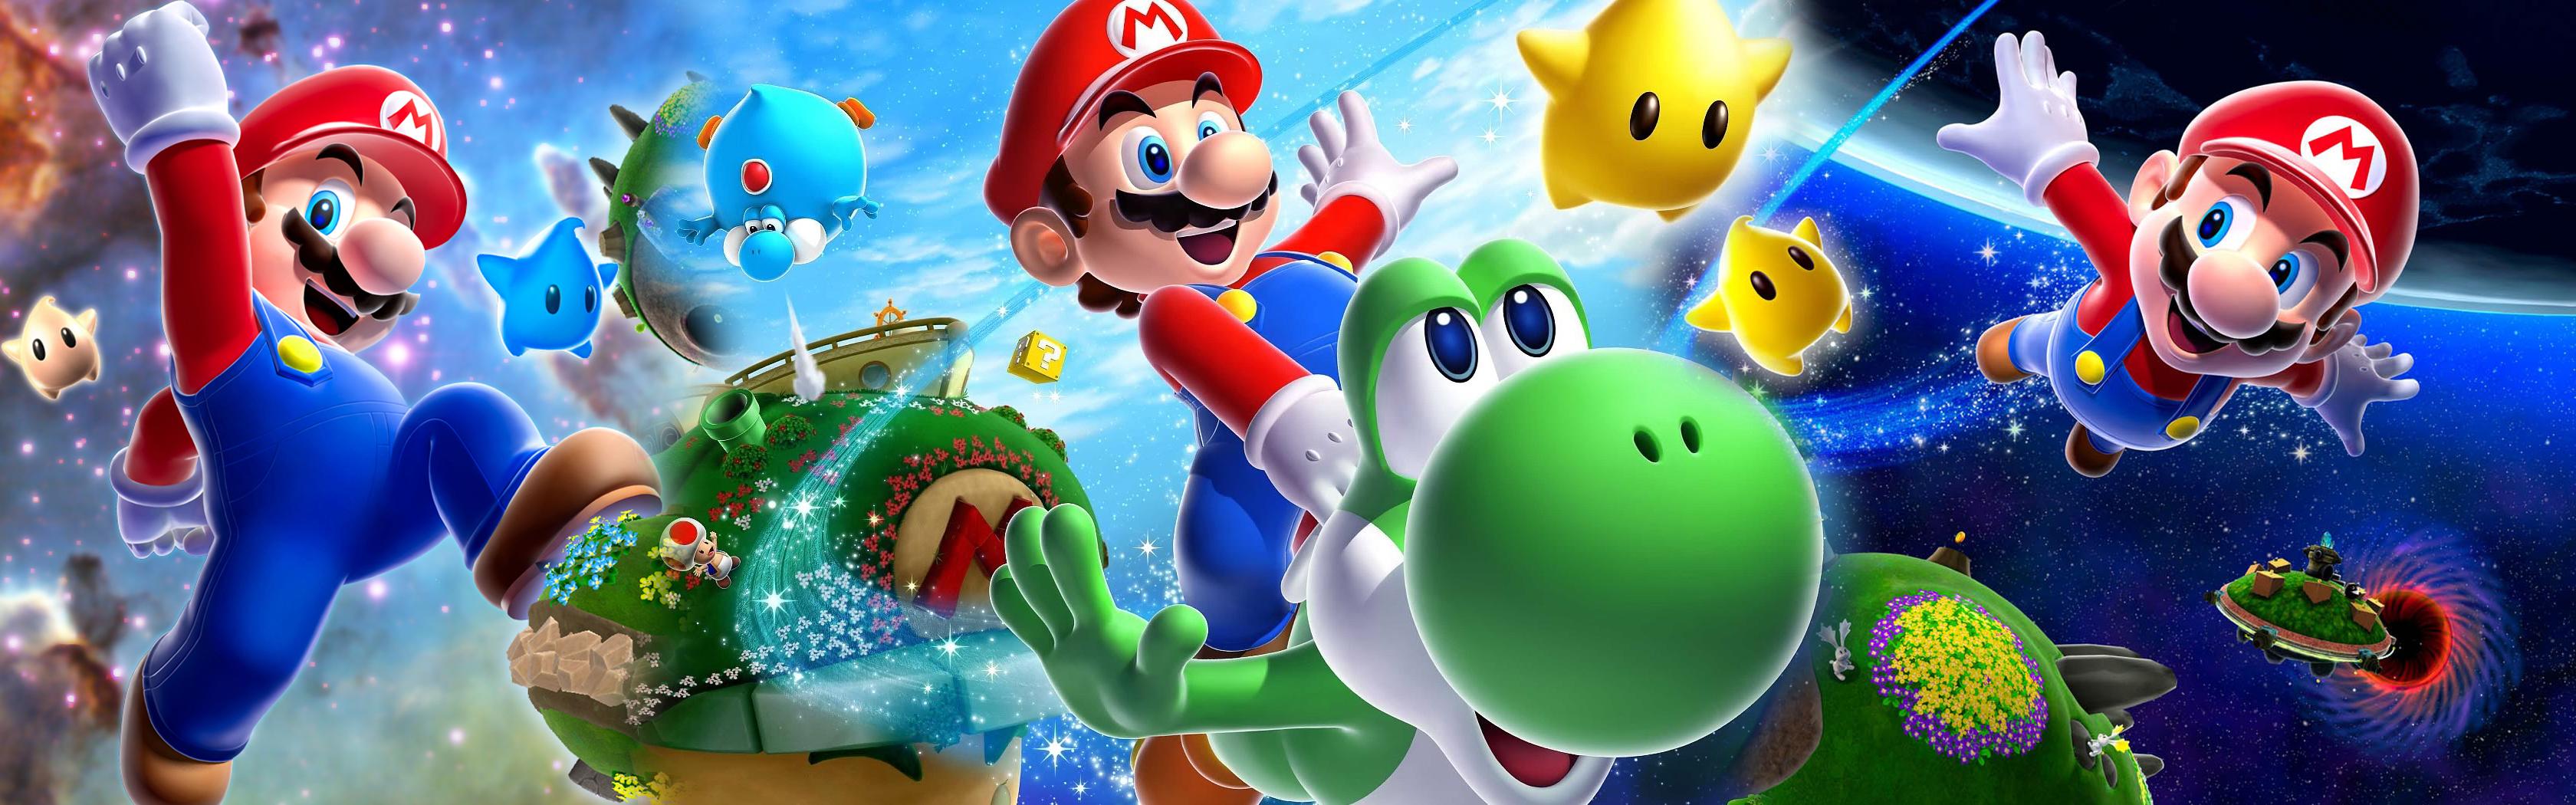 Super Mario Galaxy 2 Wallpaper By Toxigyn On Deviantart